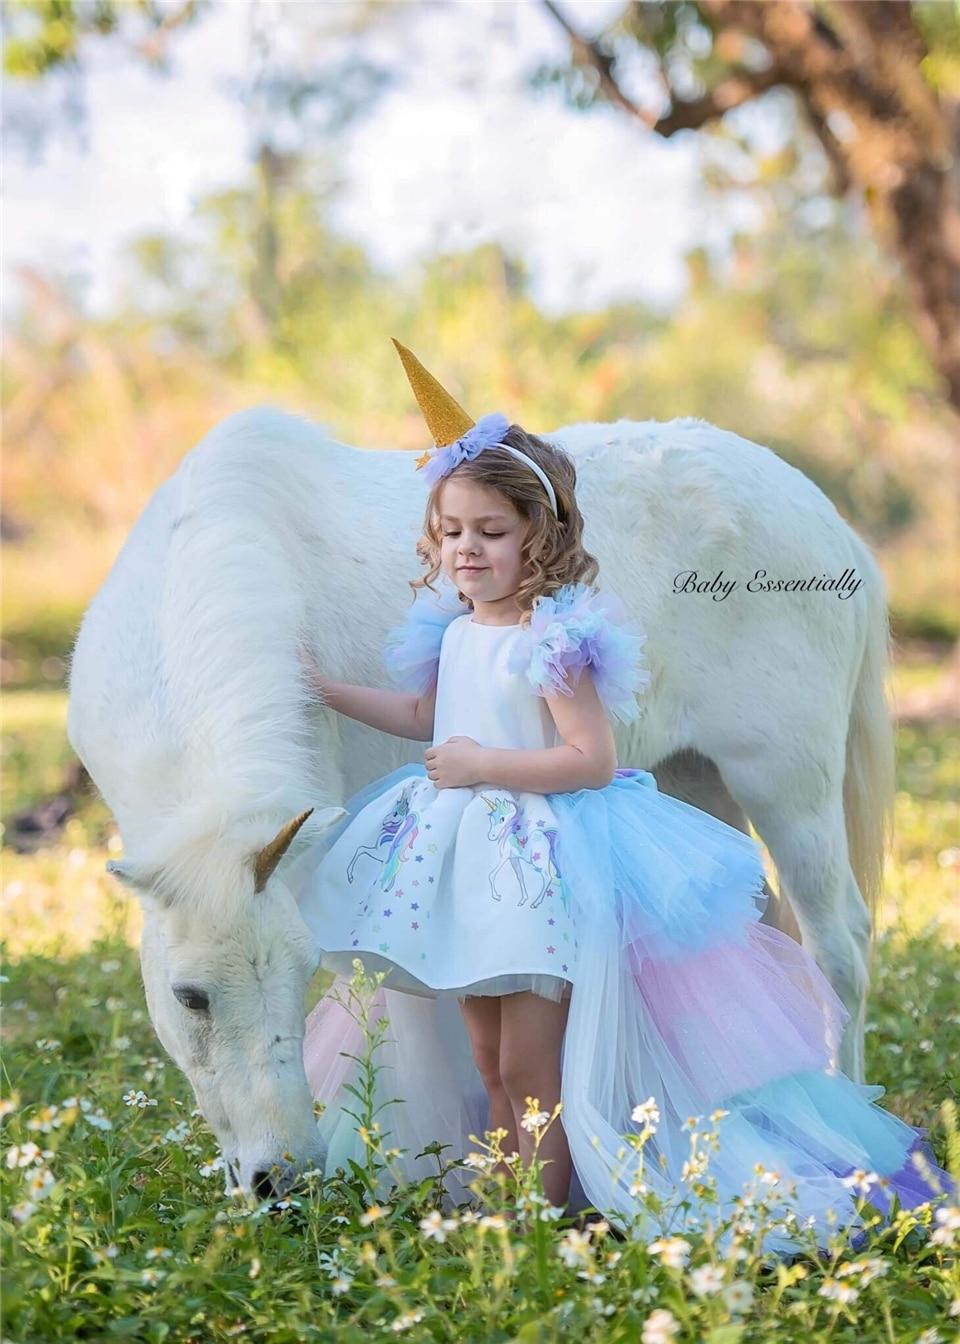 HTB1UUUQb3KG3KVjSZFLq6yMvXXa1 Christmas Fluffy Girl Princess Unicorn Dress Gorgeous Backless Long Tail Wedding Dress Kids  Halloween Unicorn Cosplay Costume